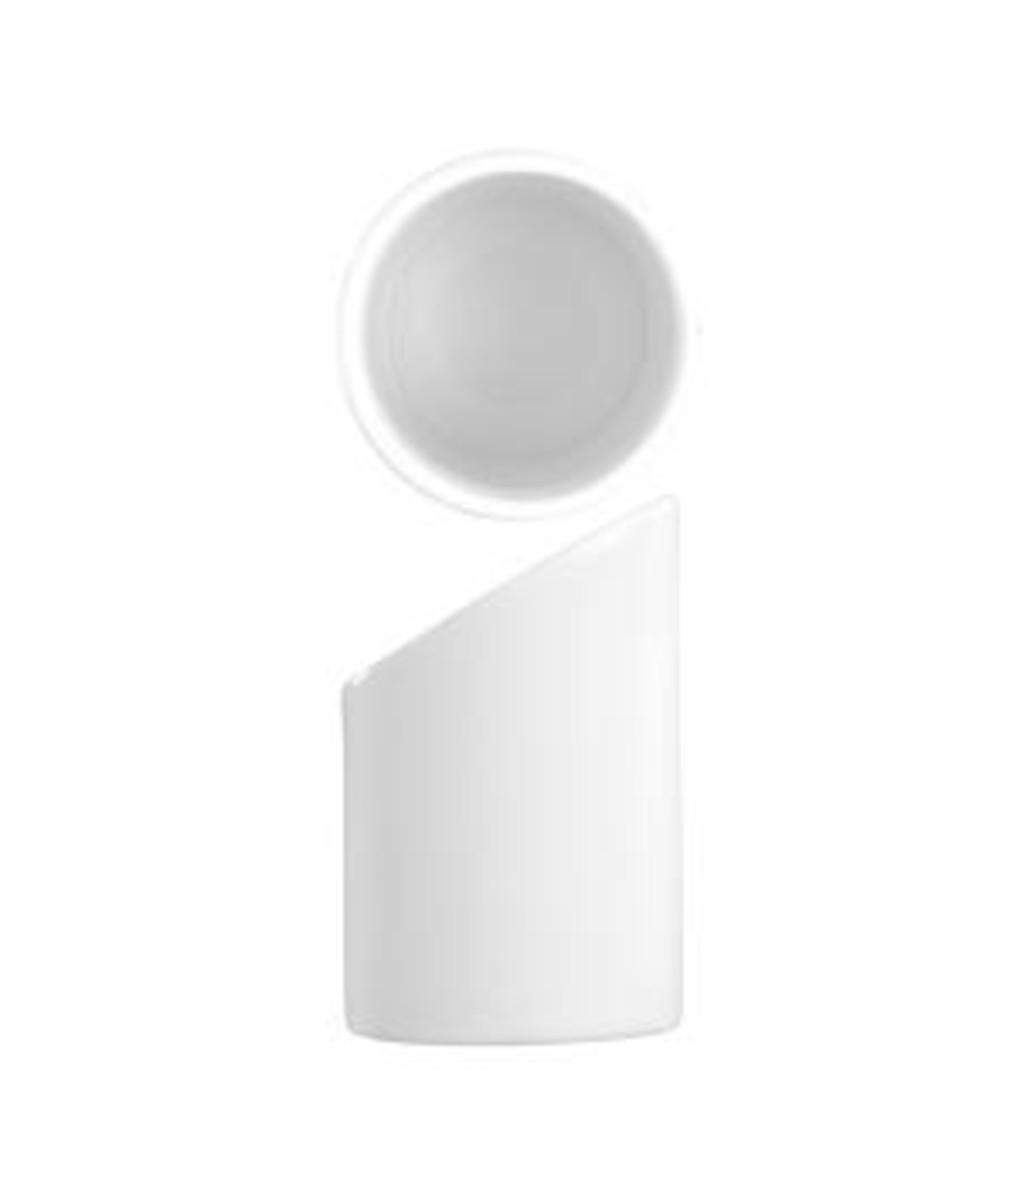 Slanted Cylinder 83x45mm 56ml by Art De Cuisine